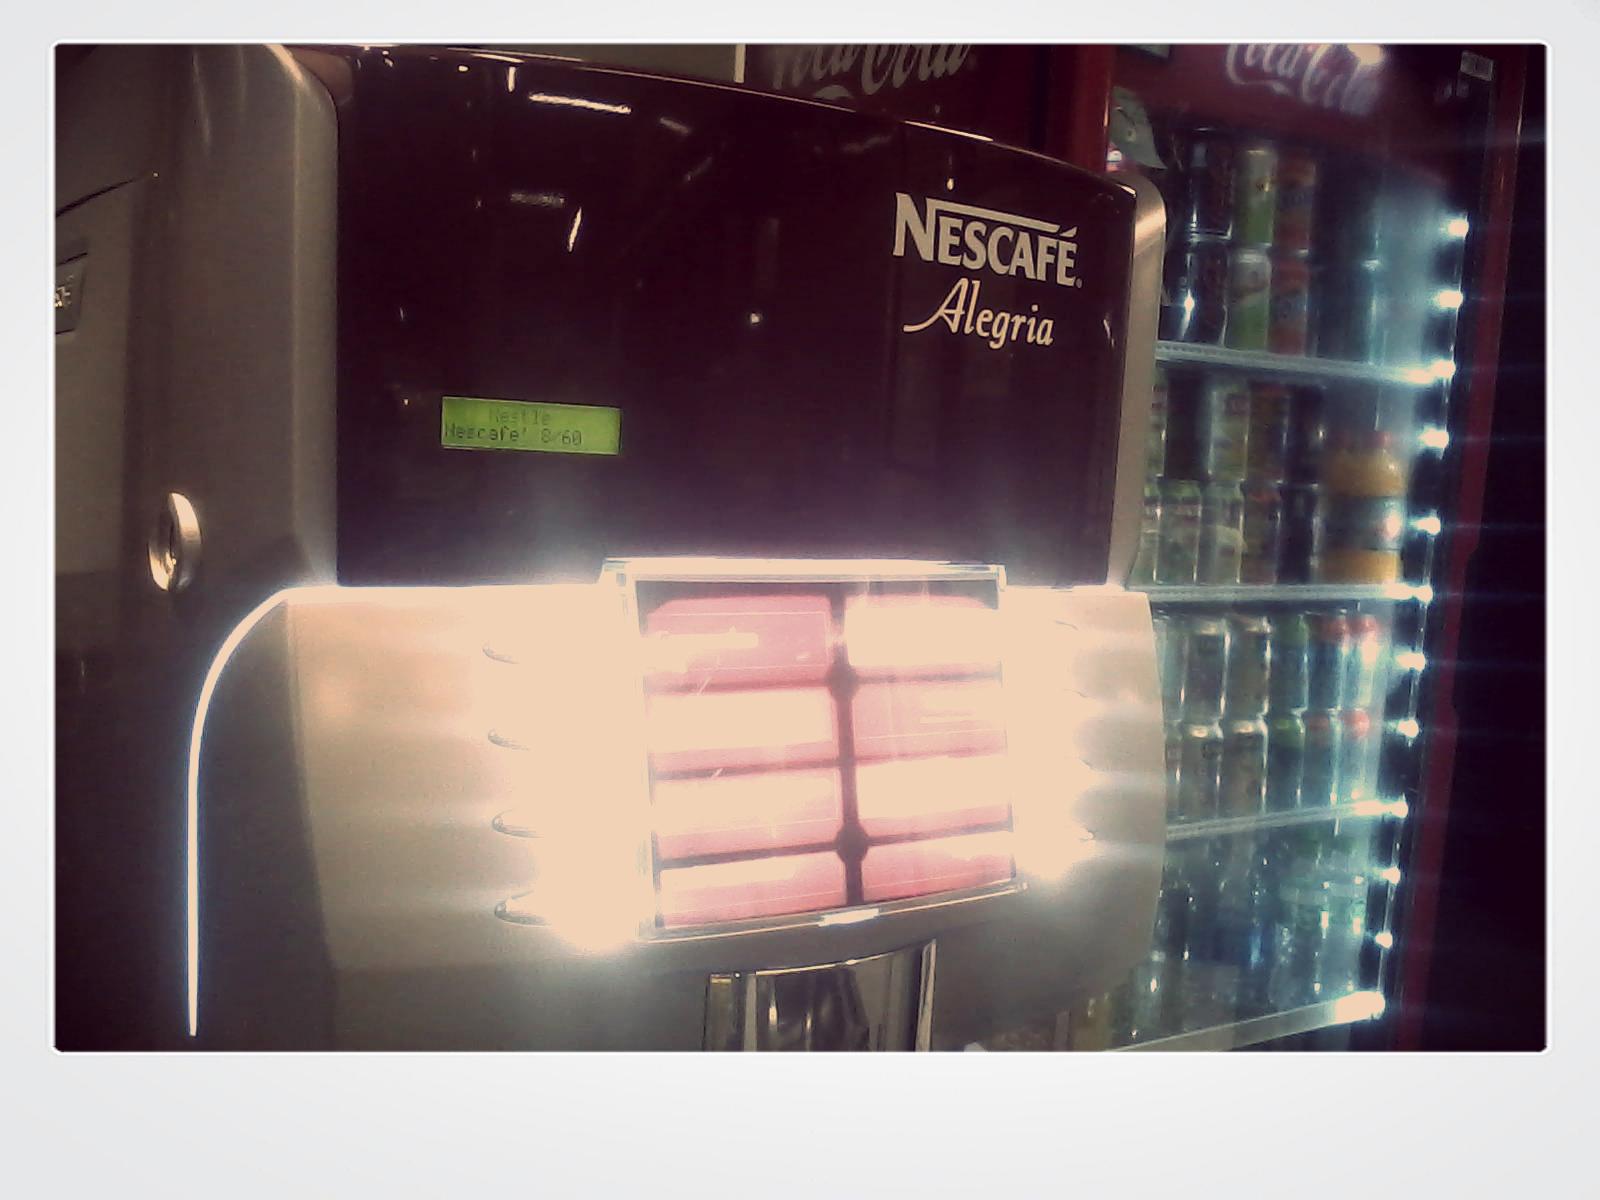 dia que descobri que chegou a máquina de Nescafé na lanchonete da